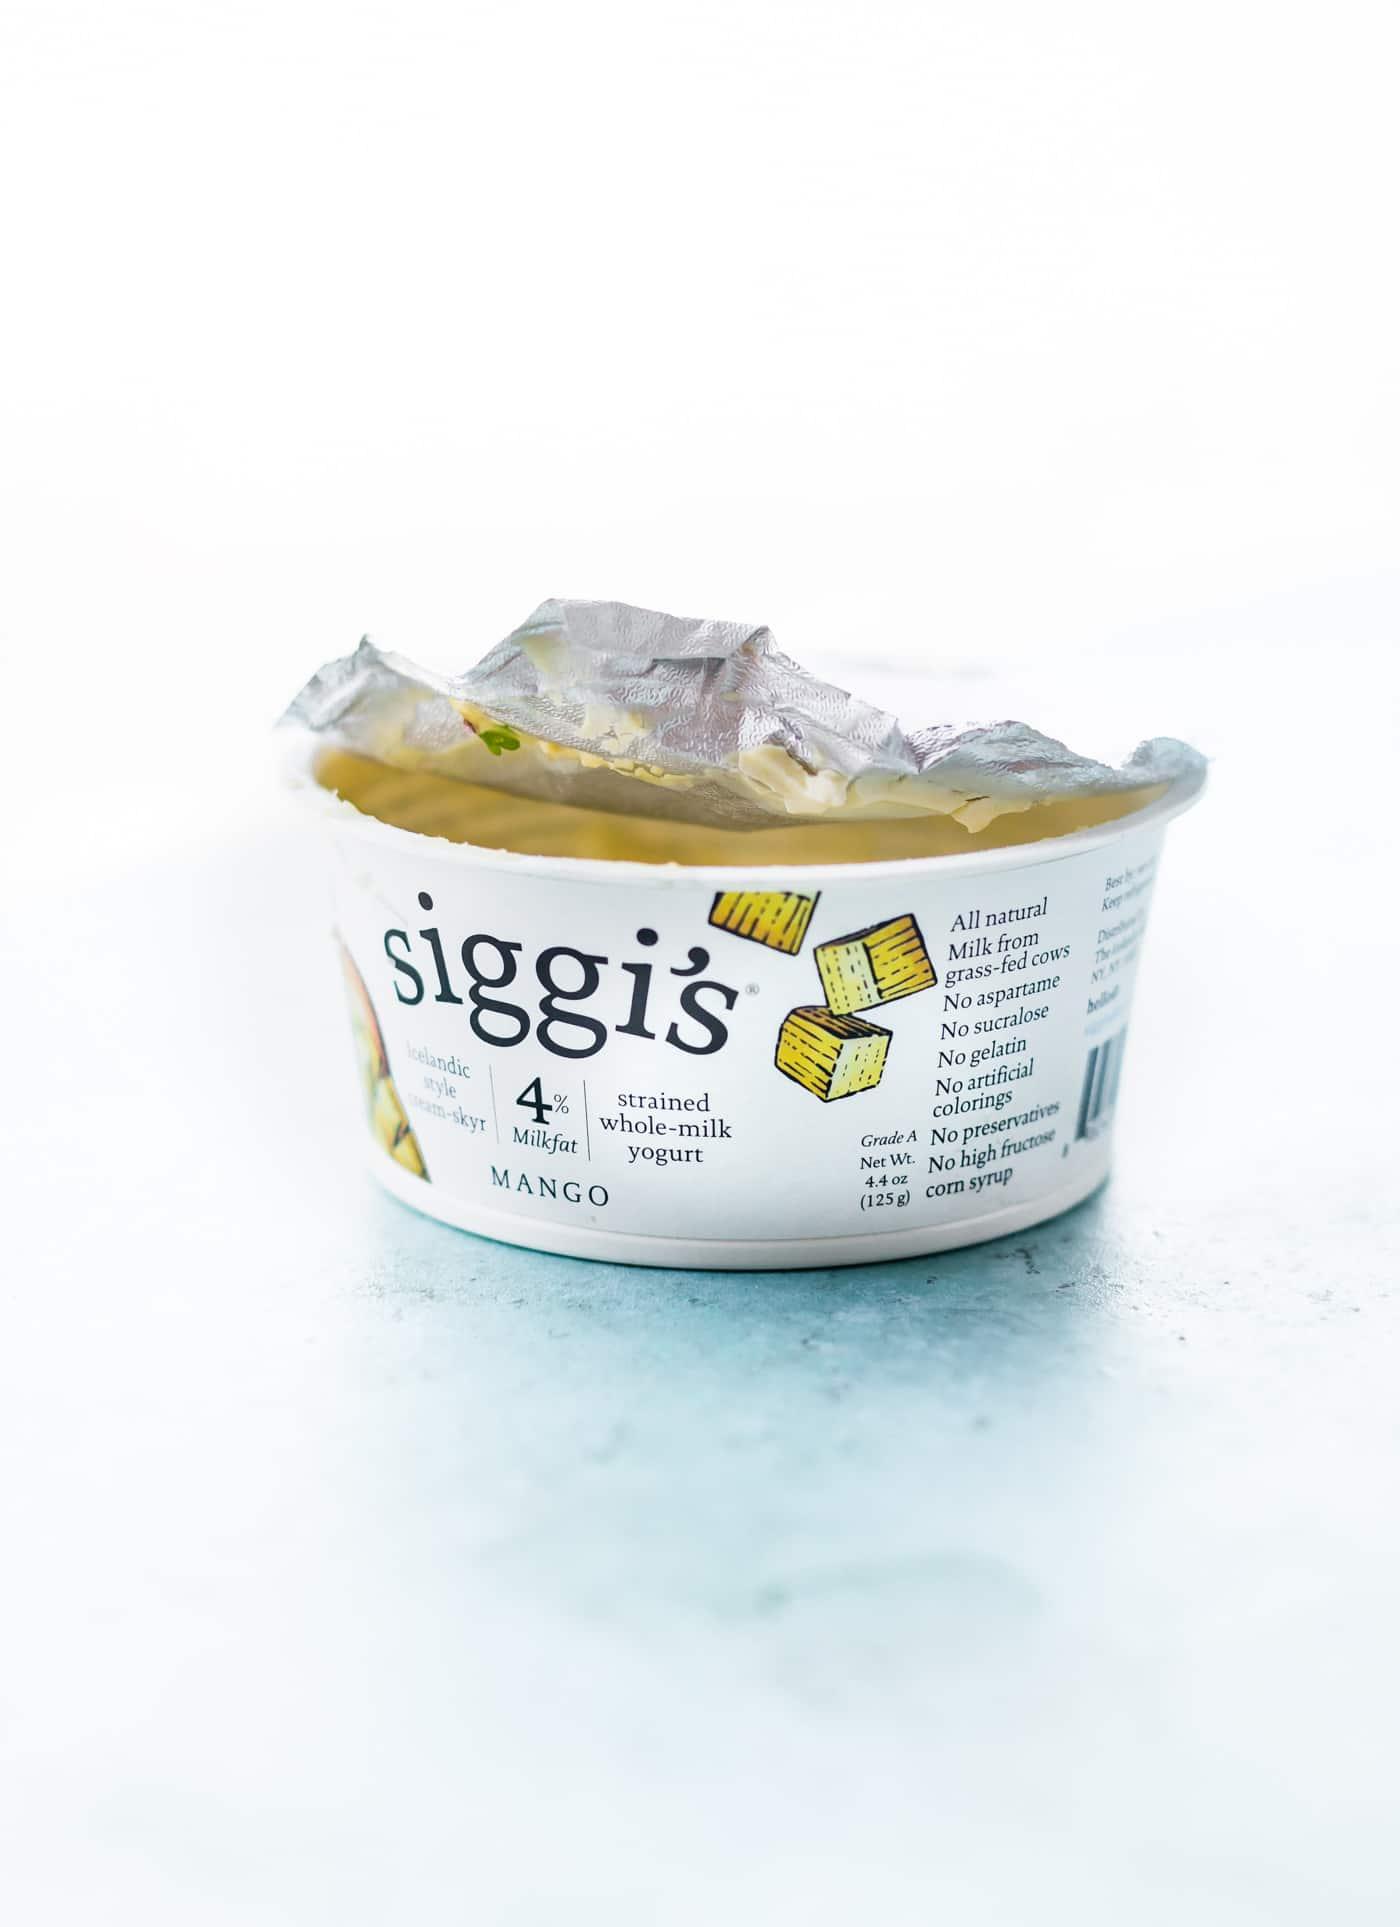 Spicy Mango Avocado Yogurt Dip! A New Way To Eat Veggies! This Spicy Mango